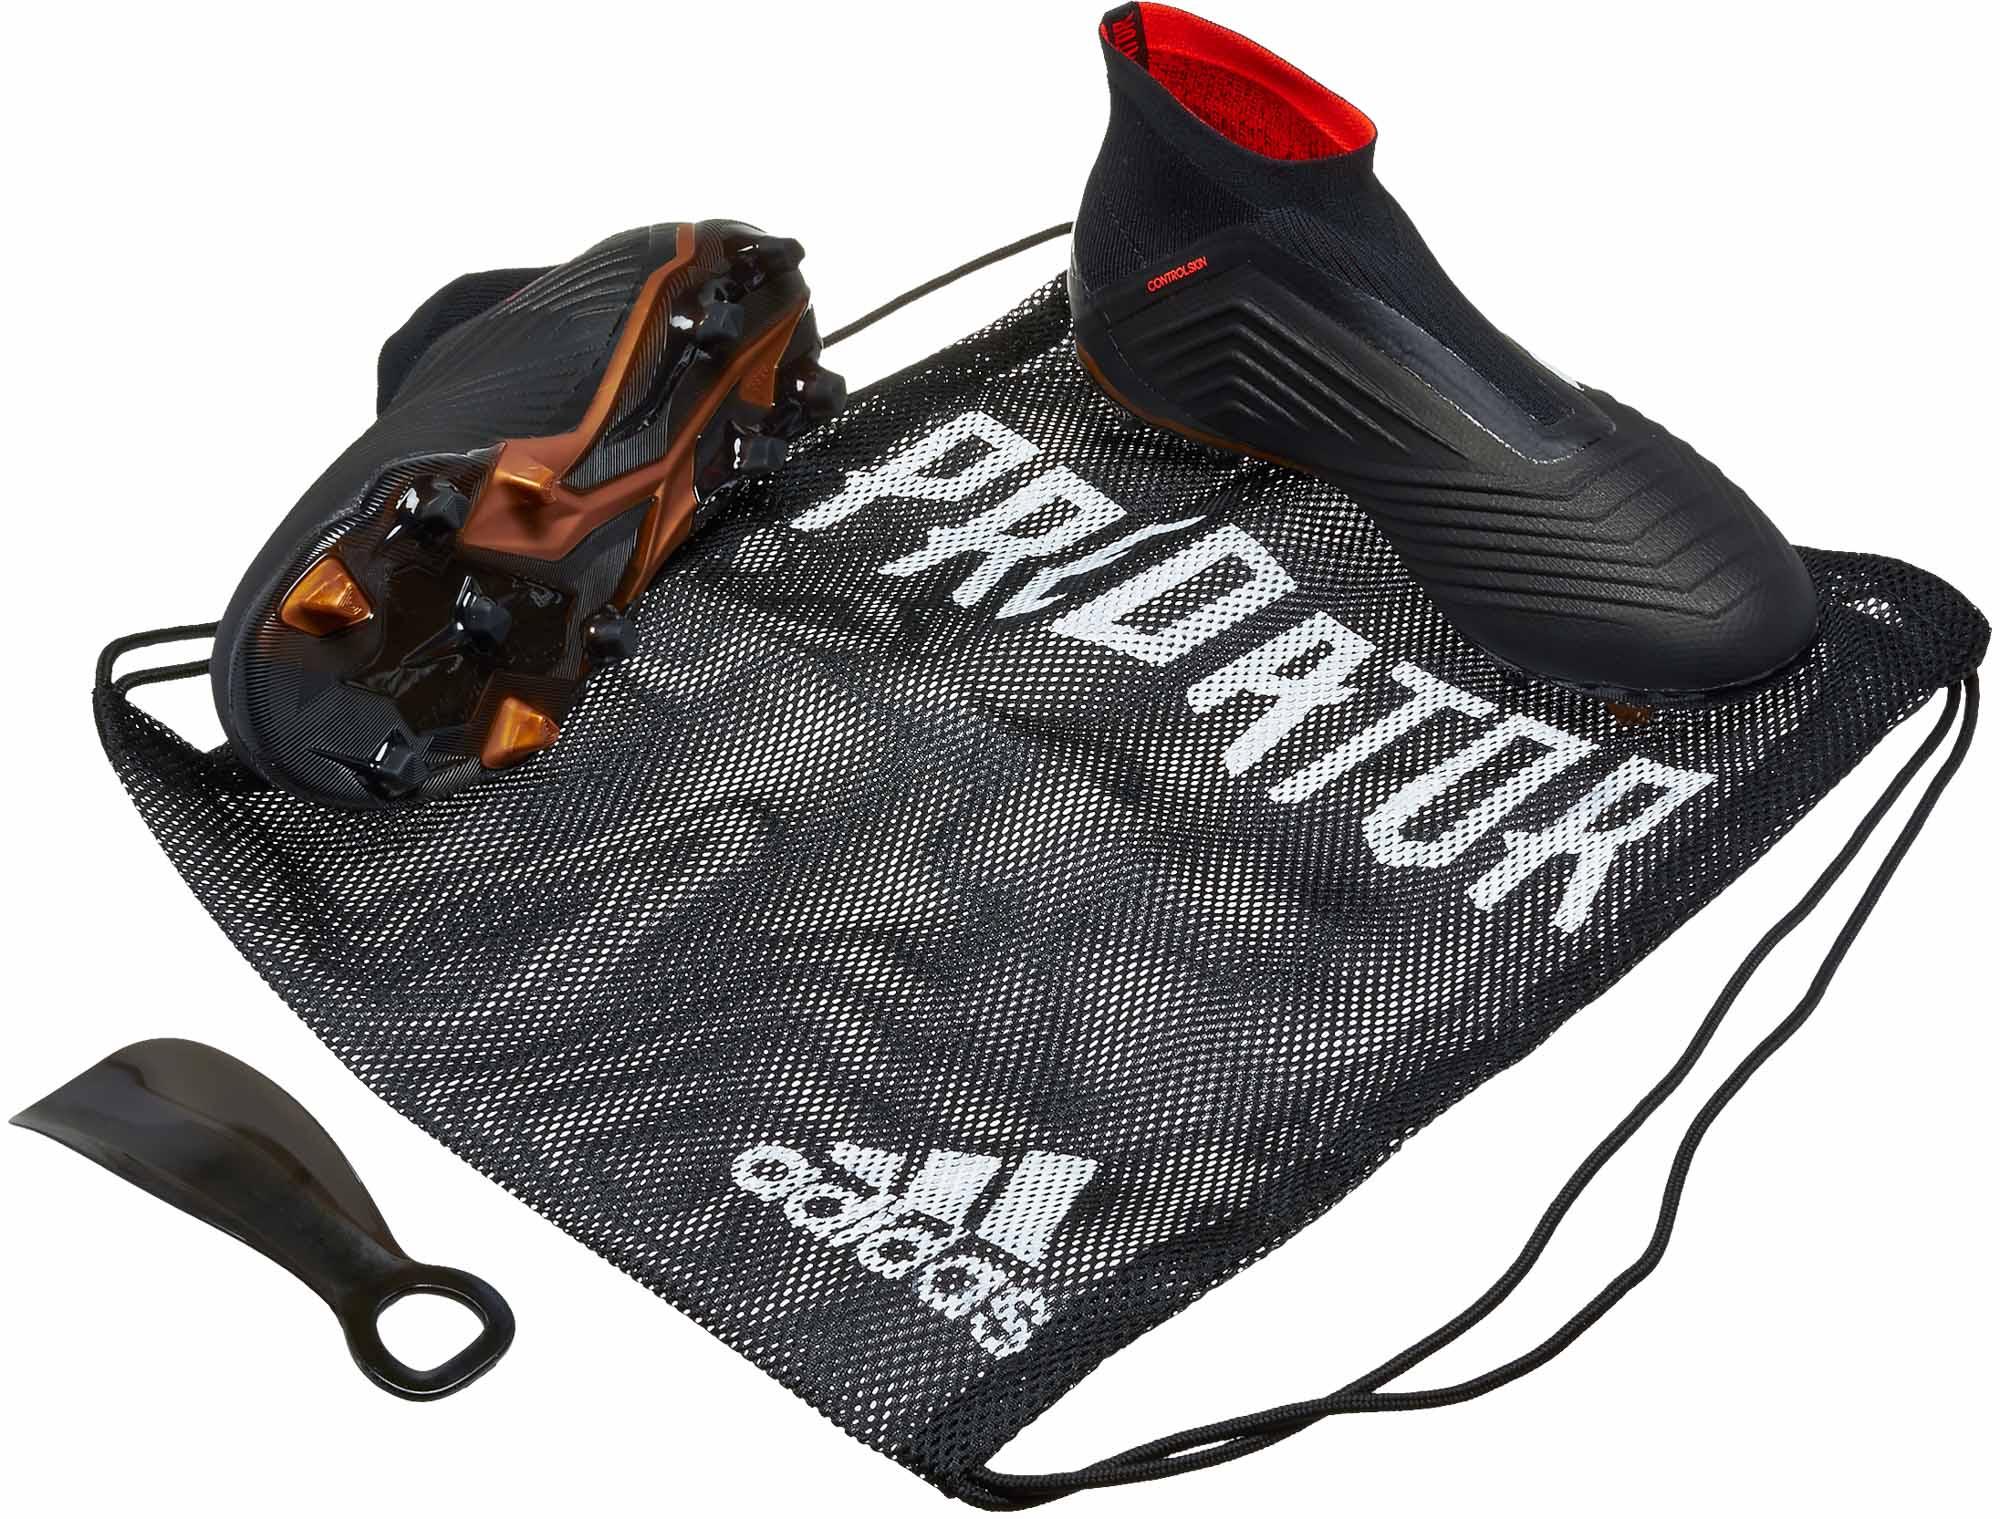 Adidas Predator Cleats Barna Svart mMhlAJdB